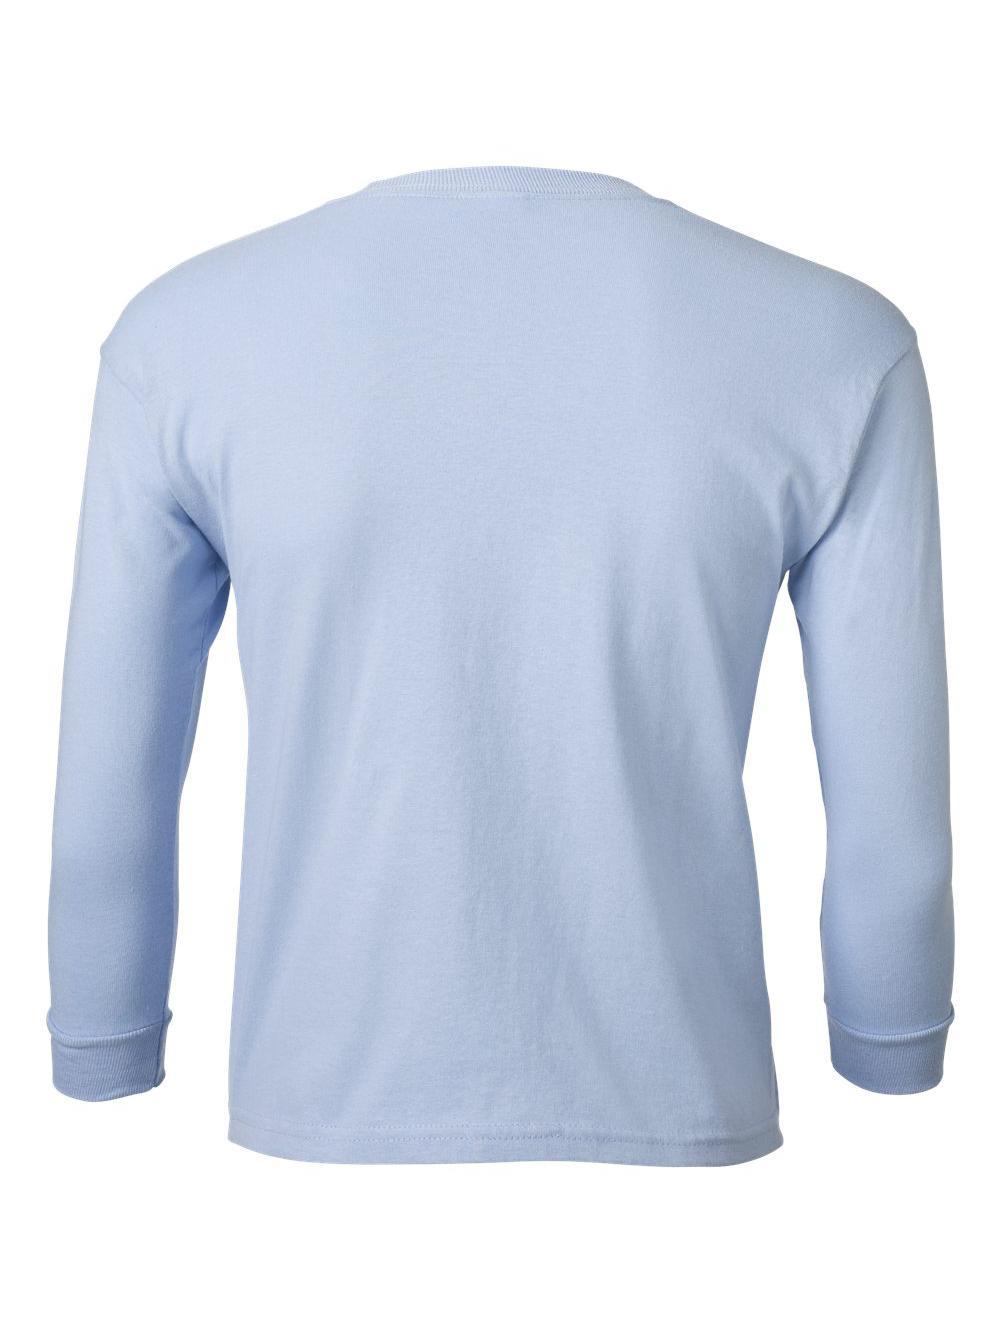 Gildan-Ultra-Cotton-Youth-Long-Sleeve-T-Shirt-2400B thumbnail 16